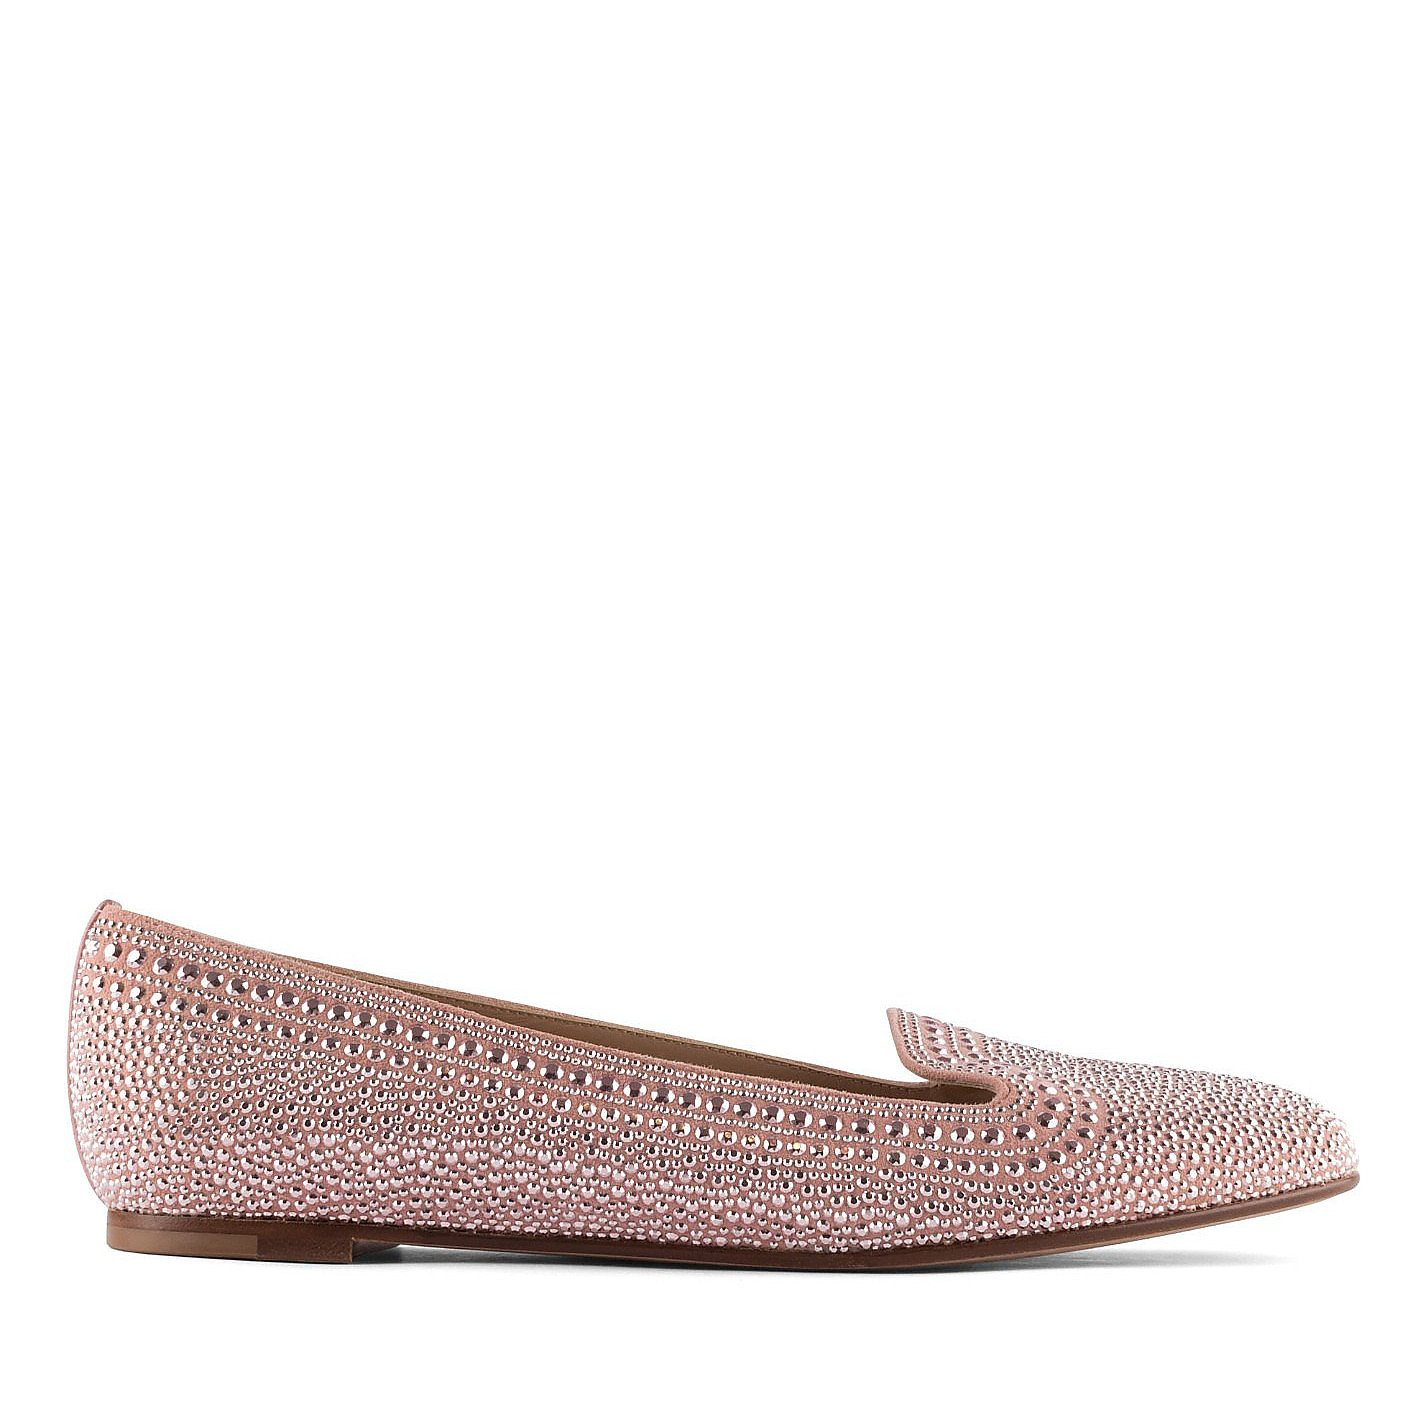 Valentino Embellished Suede Loafers